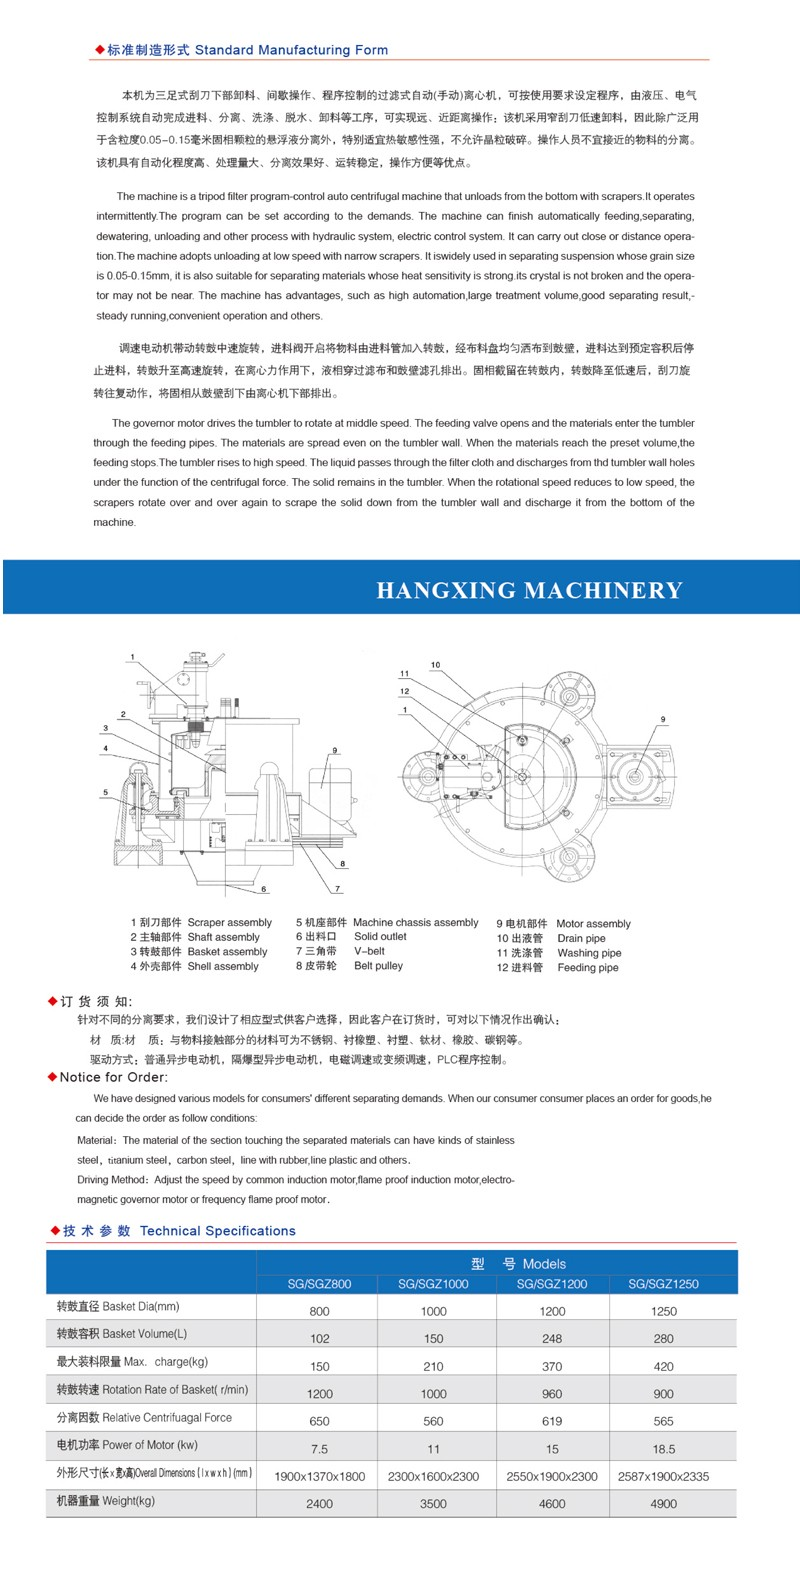 13SG SGZ 三足式(手动)刮刀下部卸料离心机3.jpg